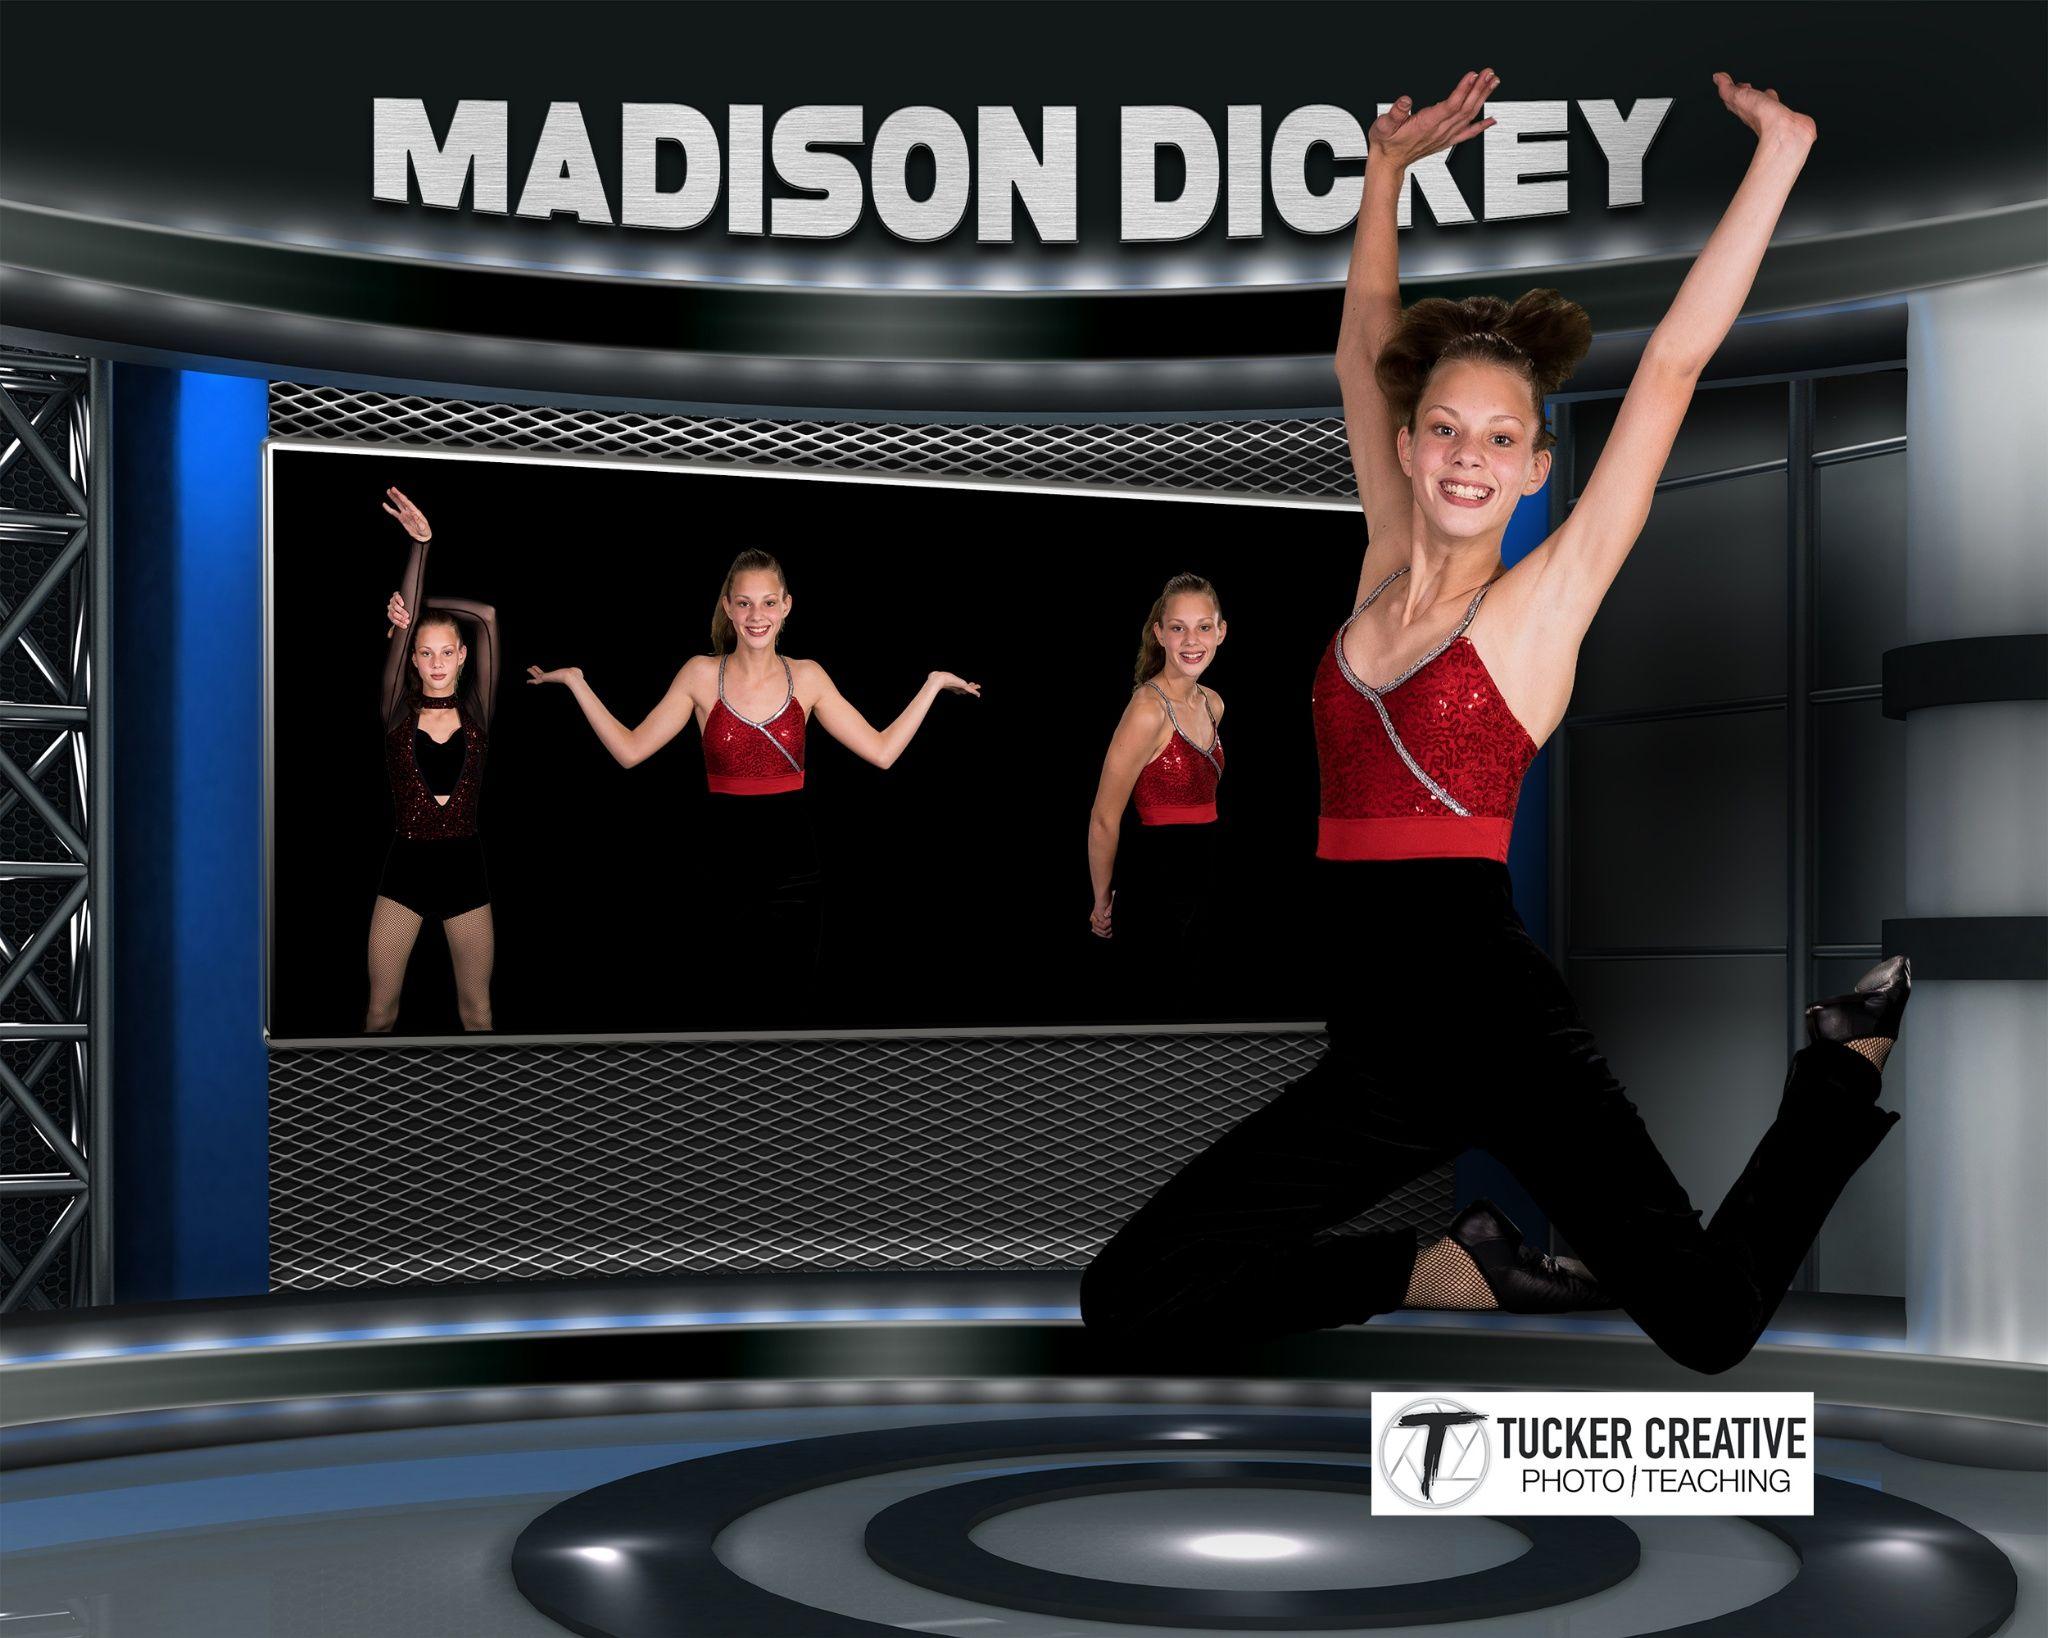 Madison Dickey